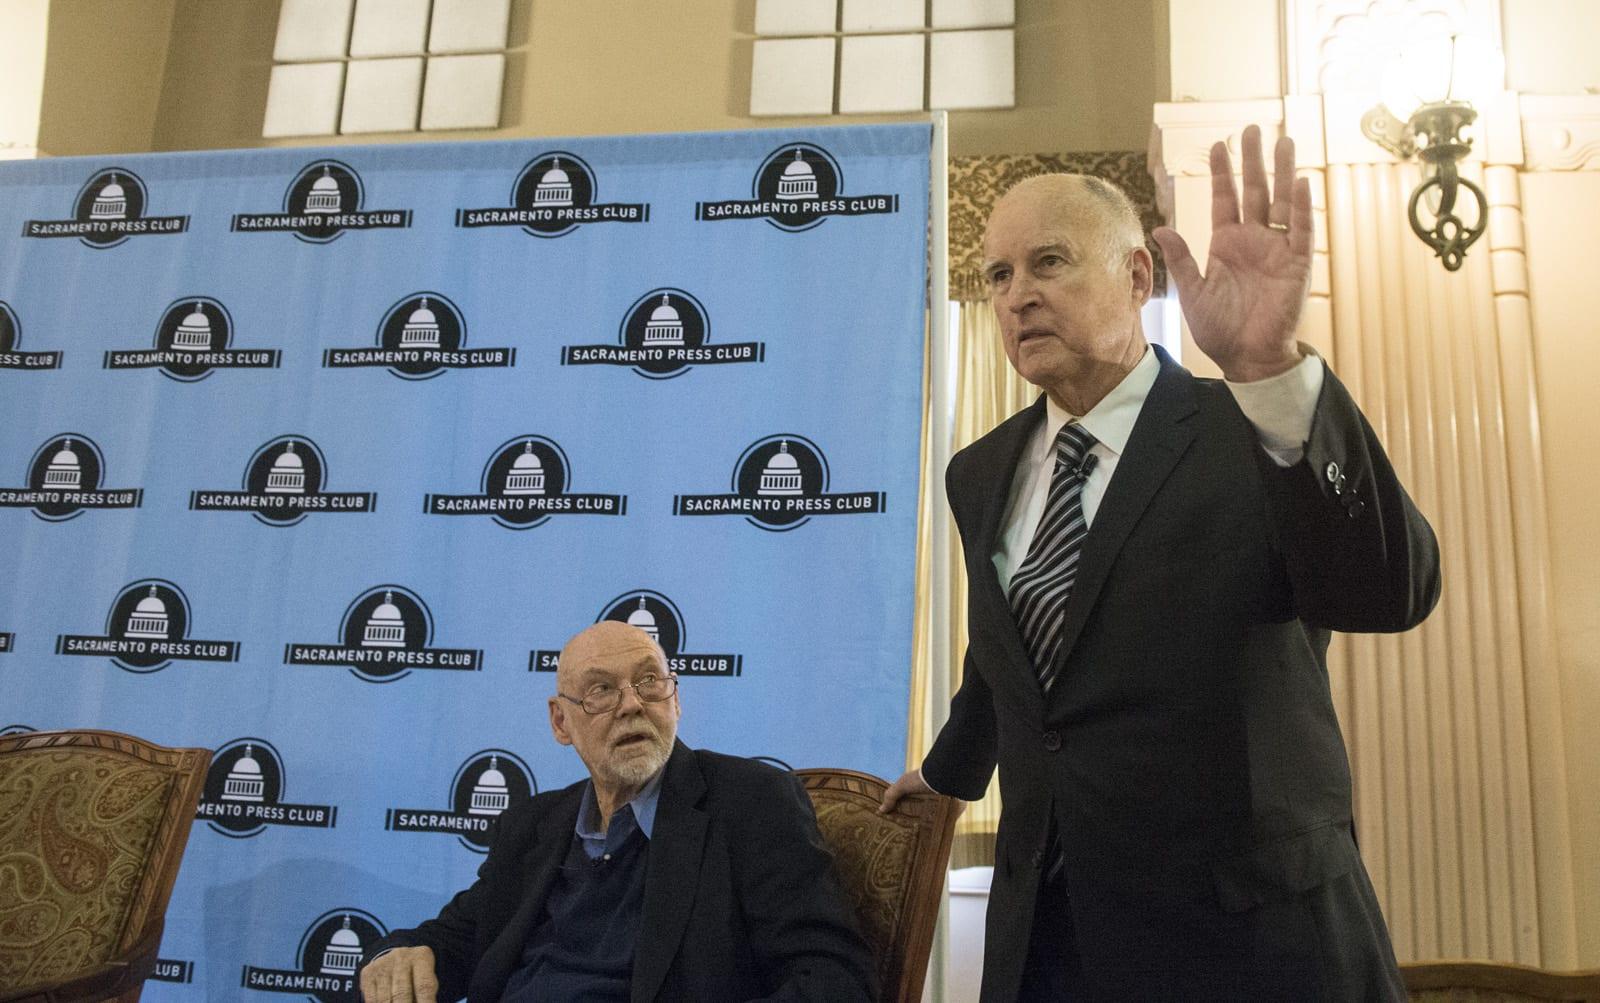 Governor Brown to Speak at Sacramento Press Club Event Tomorrow